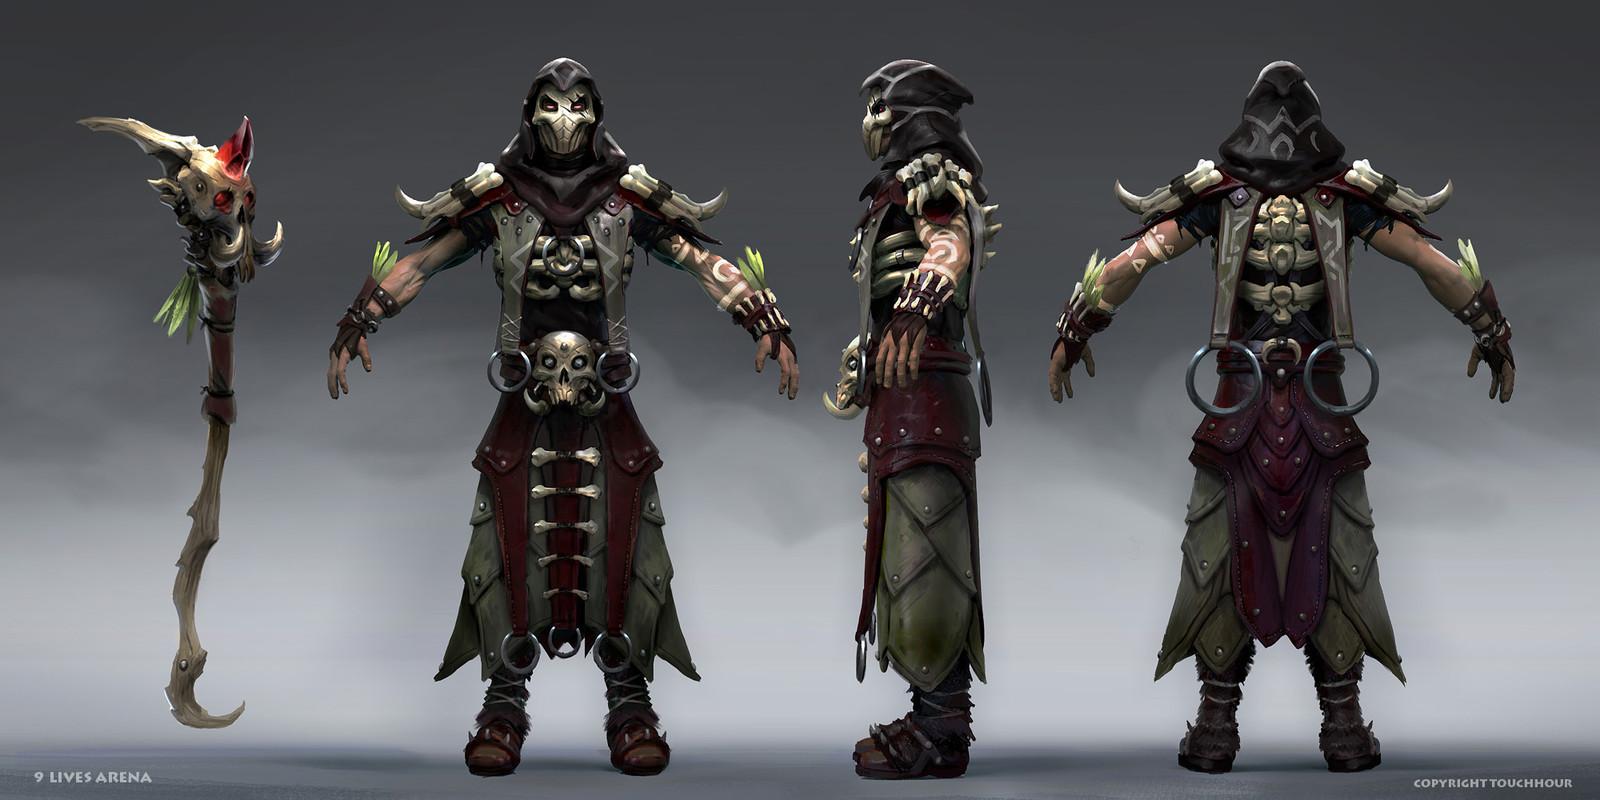 9 Lives Arena - Necromancers